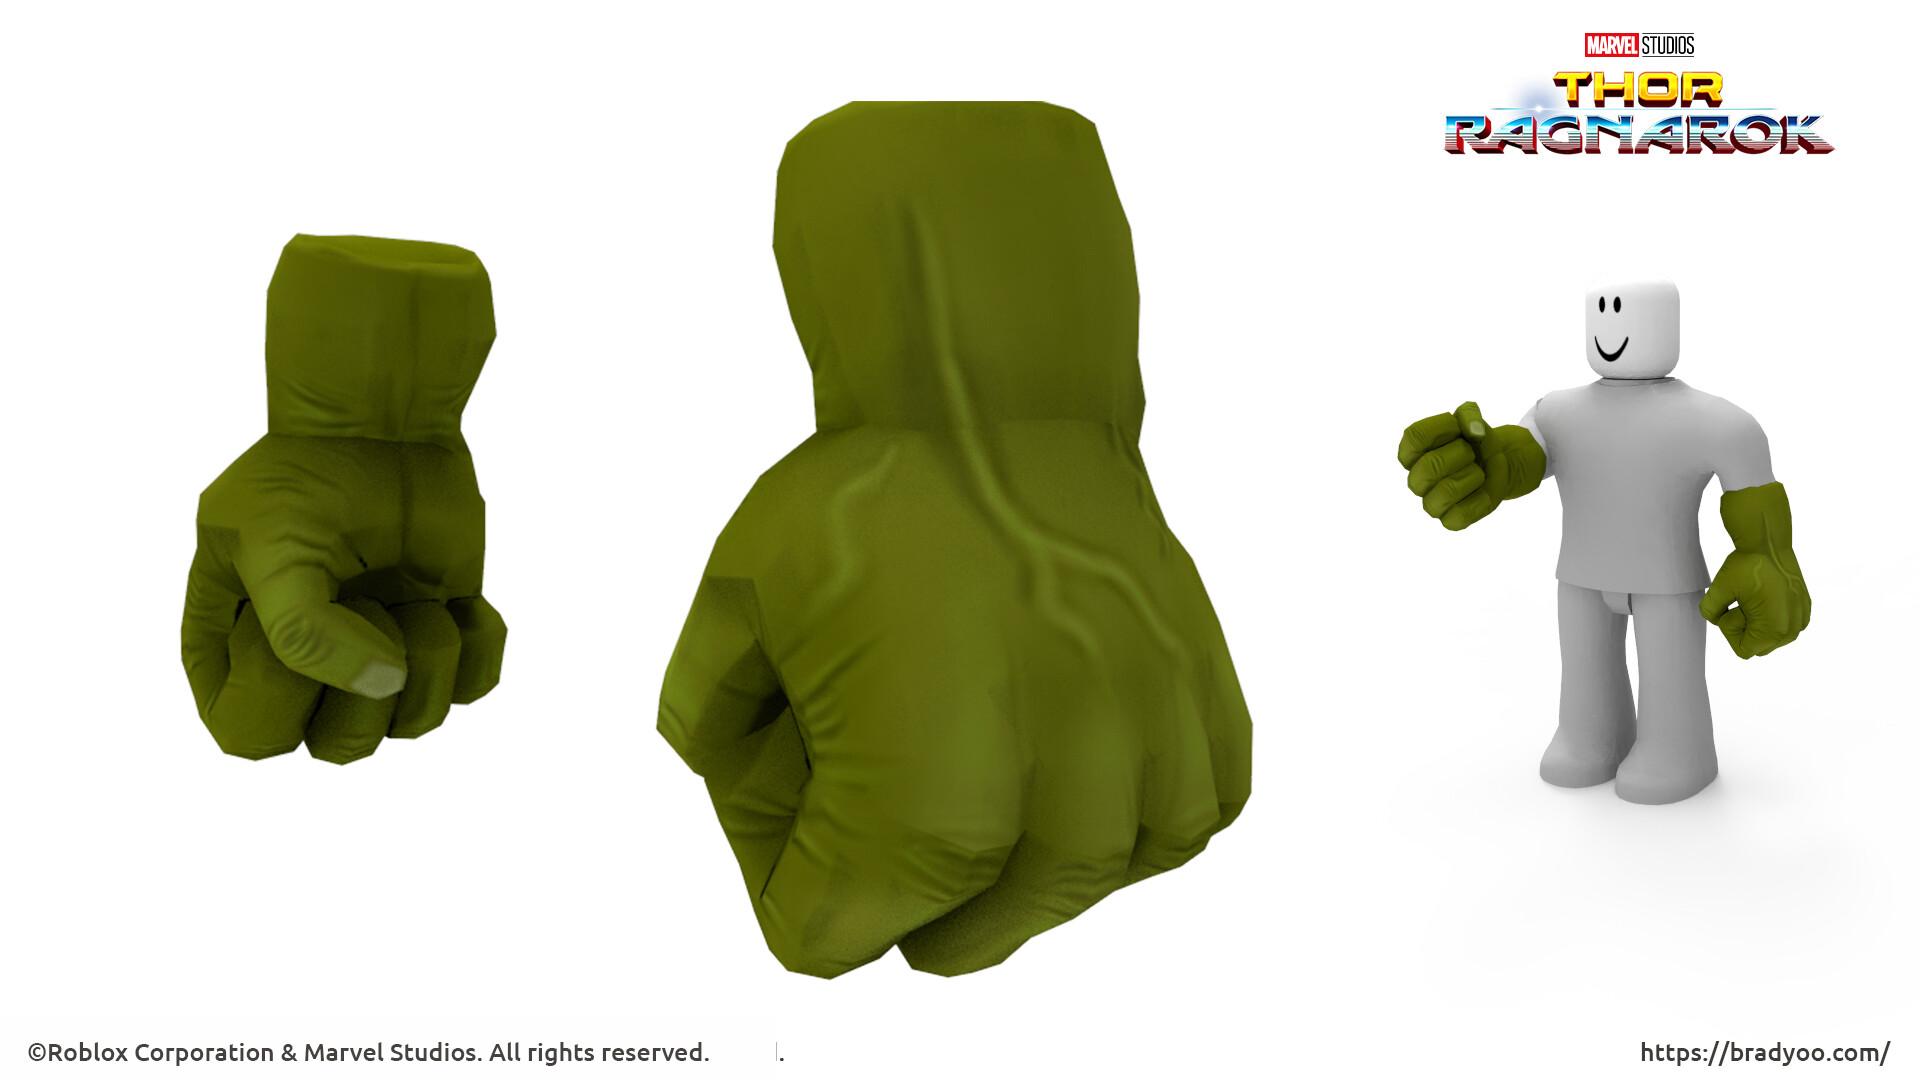 Brx yoo ragnarok hulk fists img 01